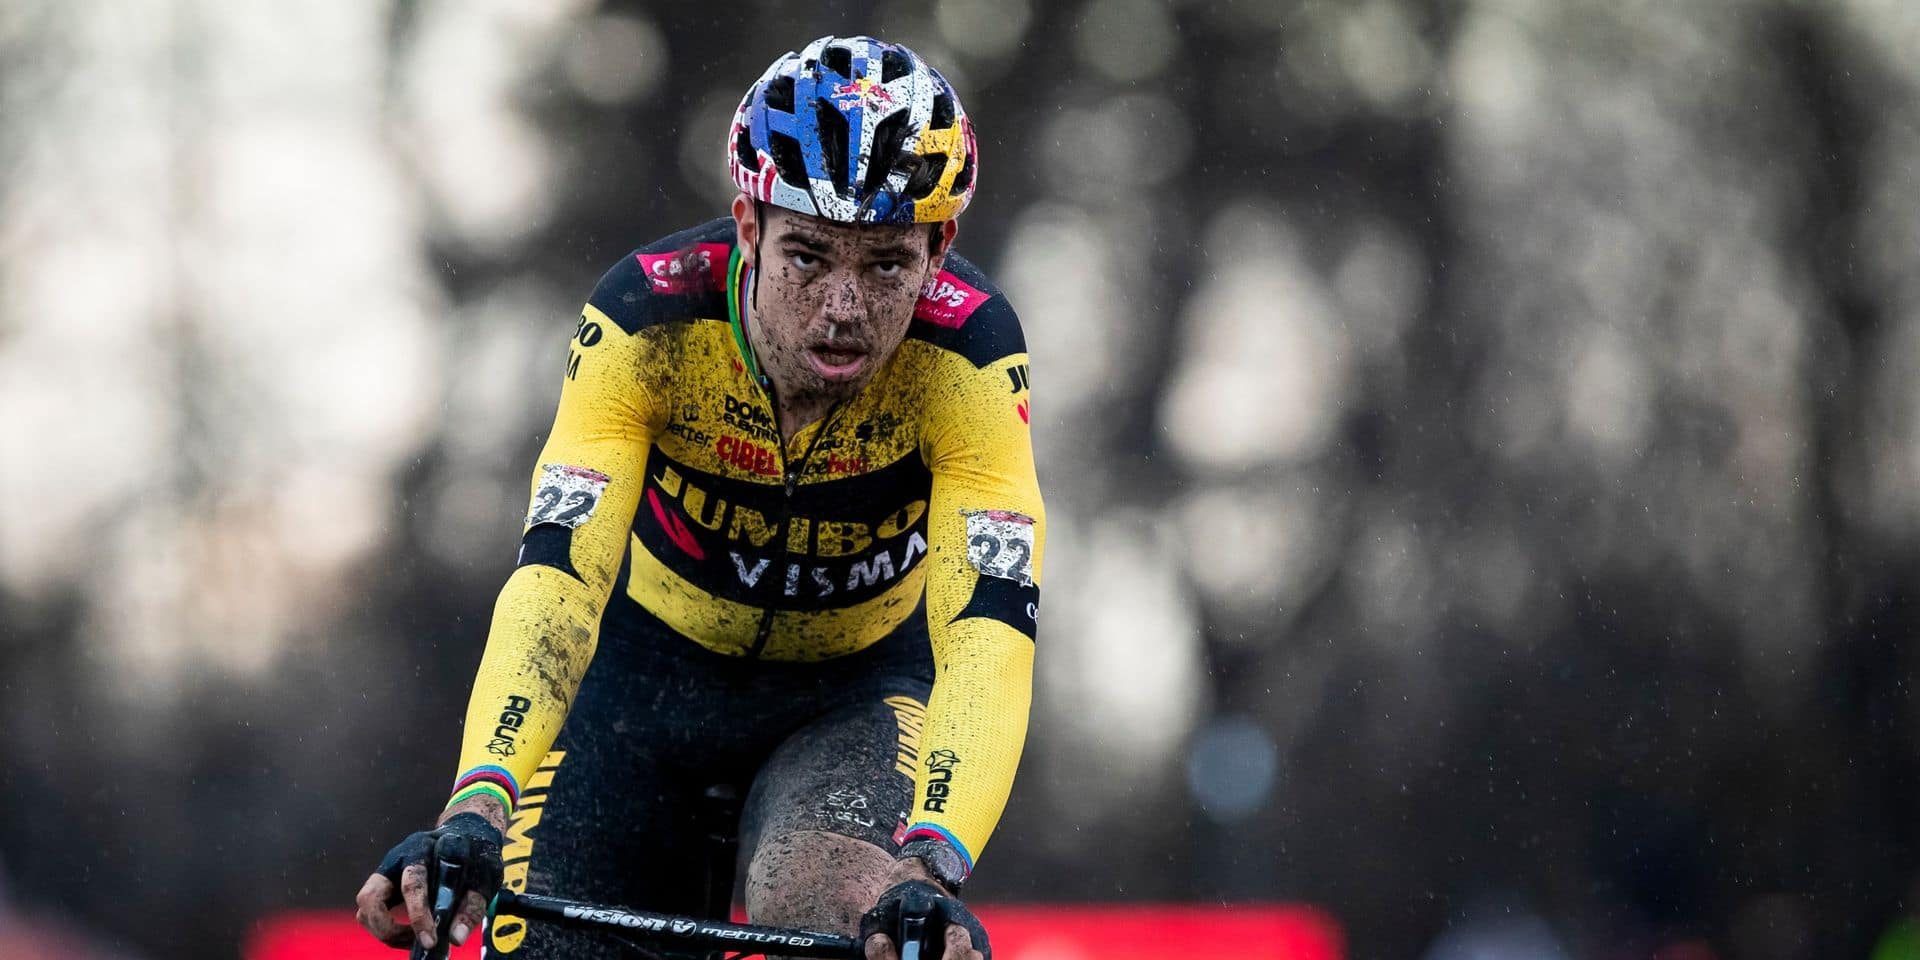 Cyclo-cross : Wout Van Aert s'impose devant Mathieu Van der Poel à Herentals